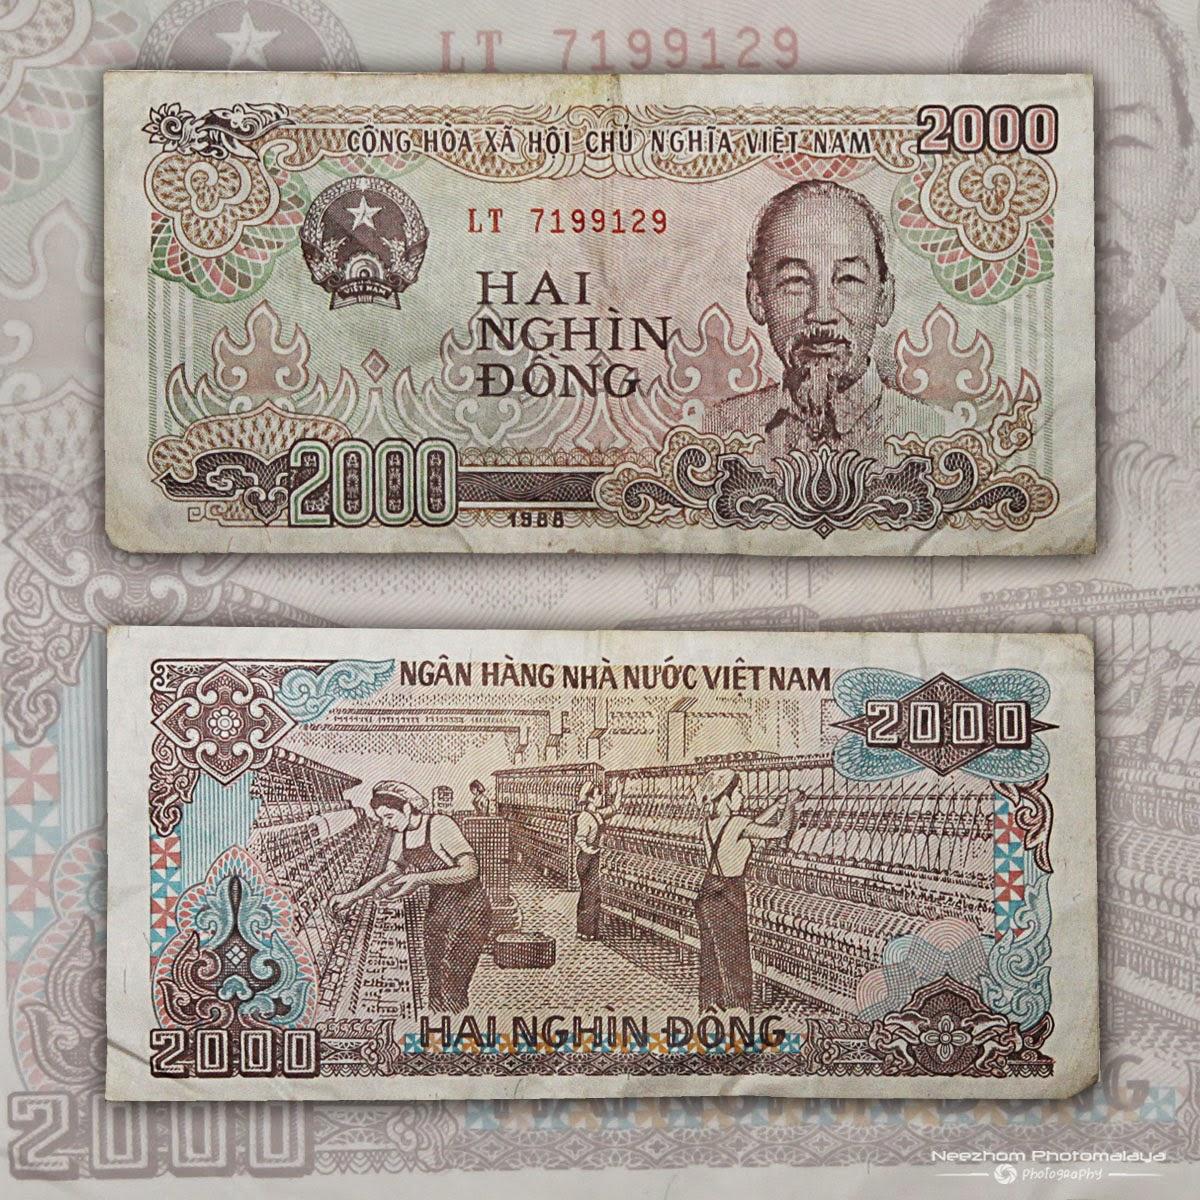 Vietnam 2000 Dong 1988 banknote